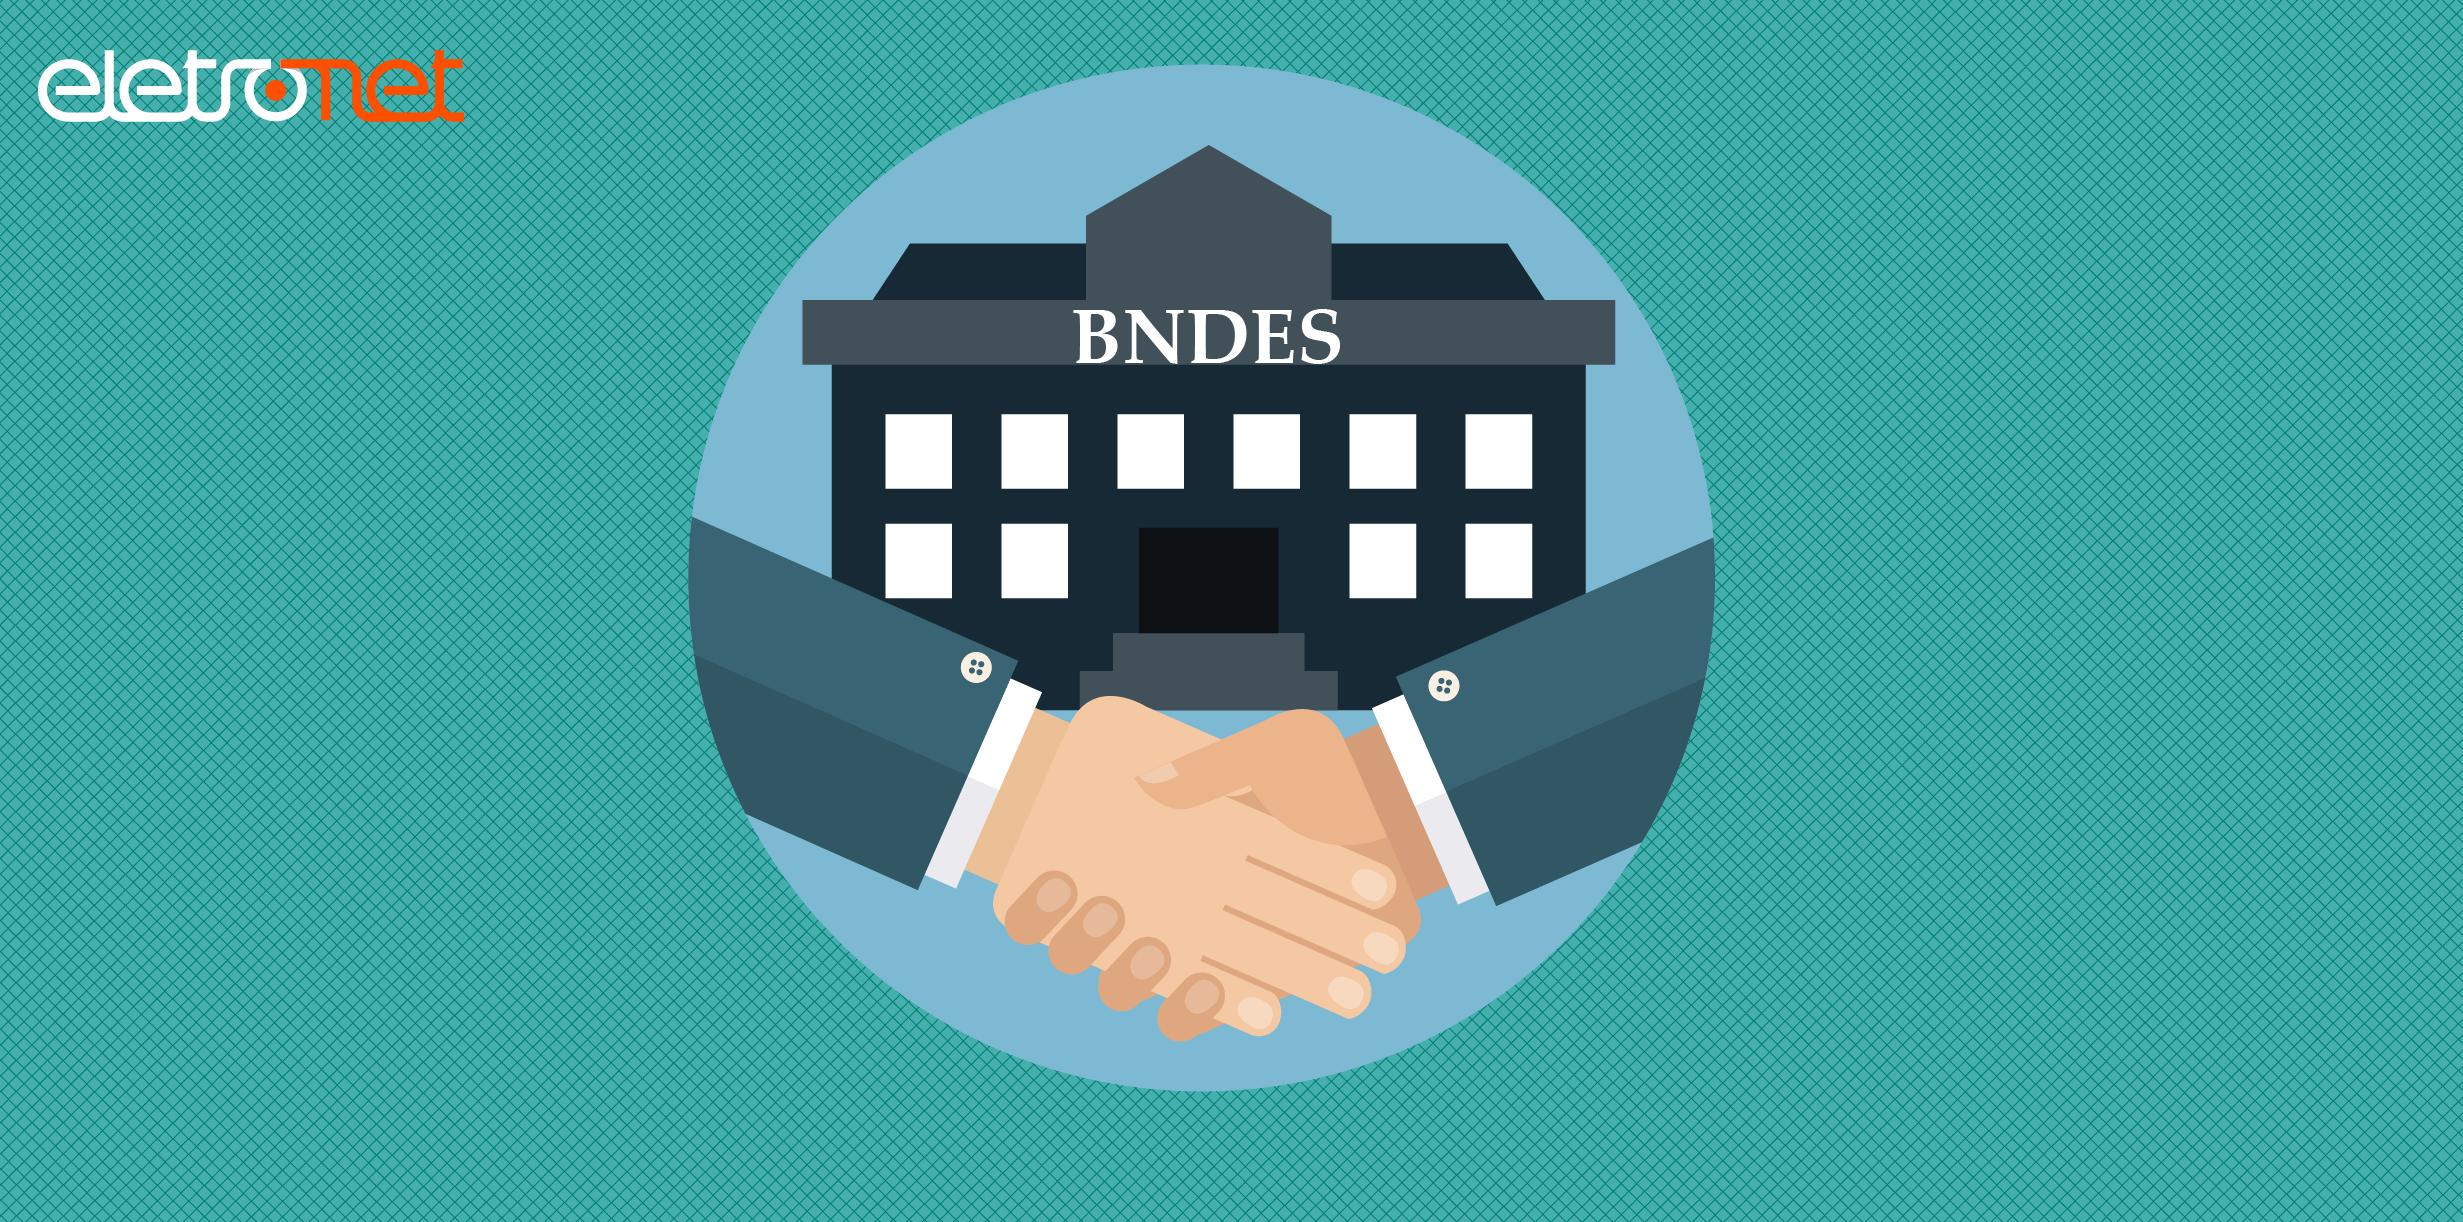 Plataforma BNDES